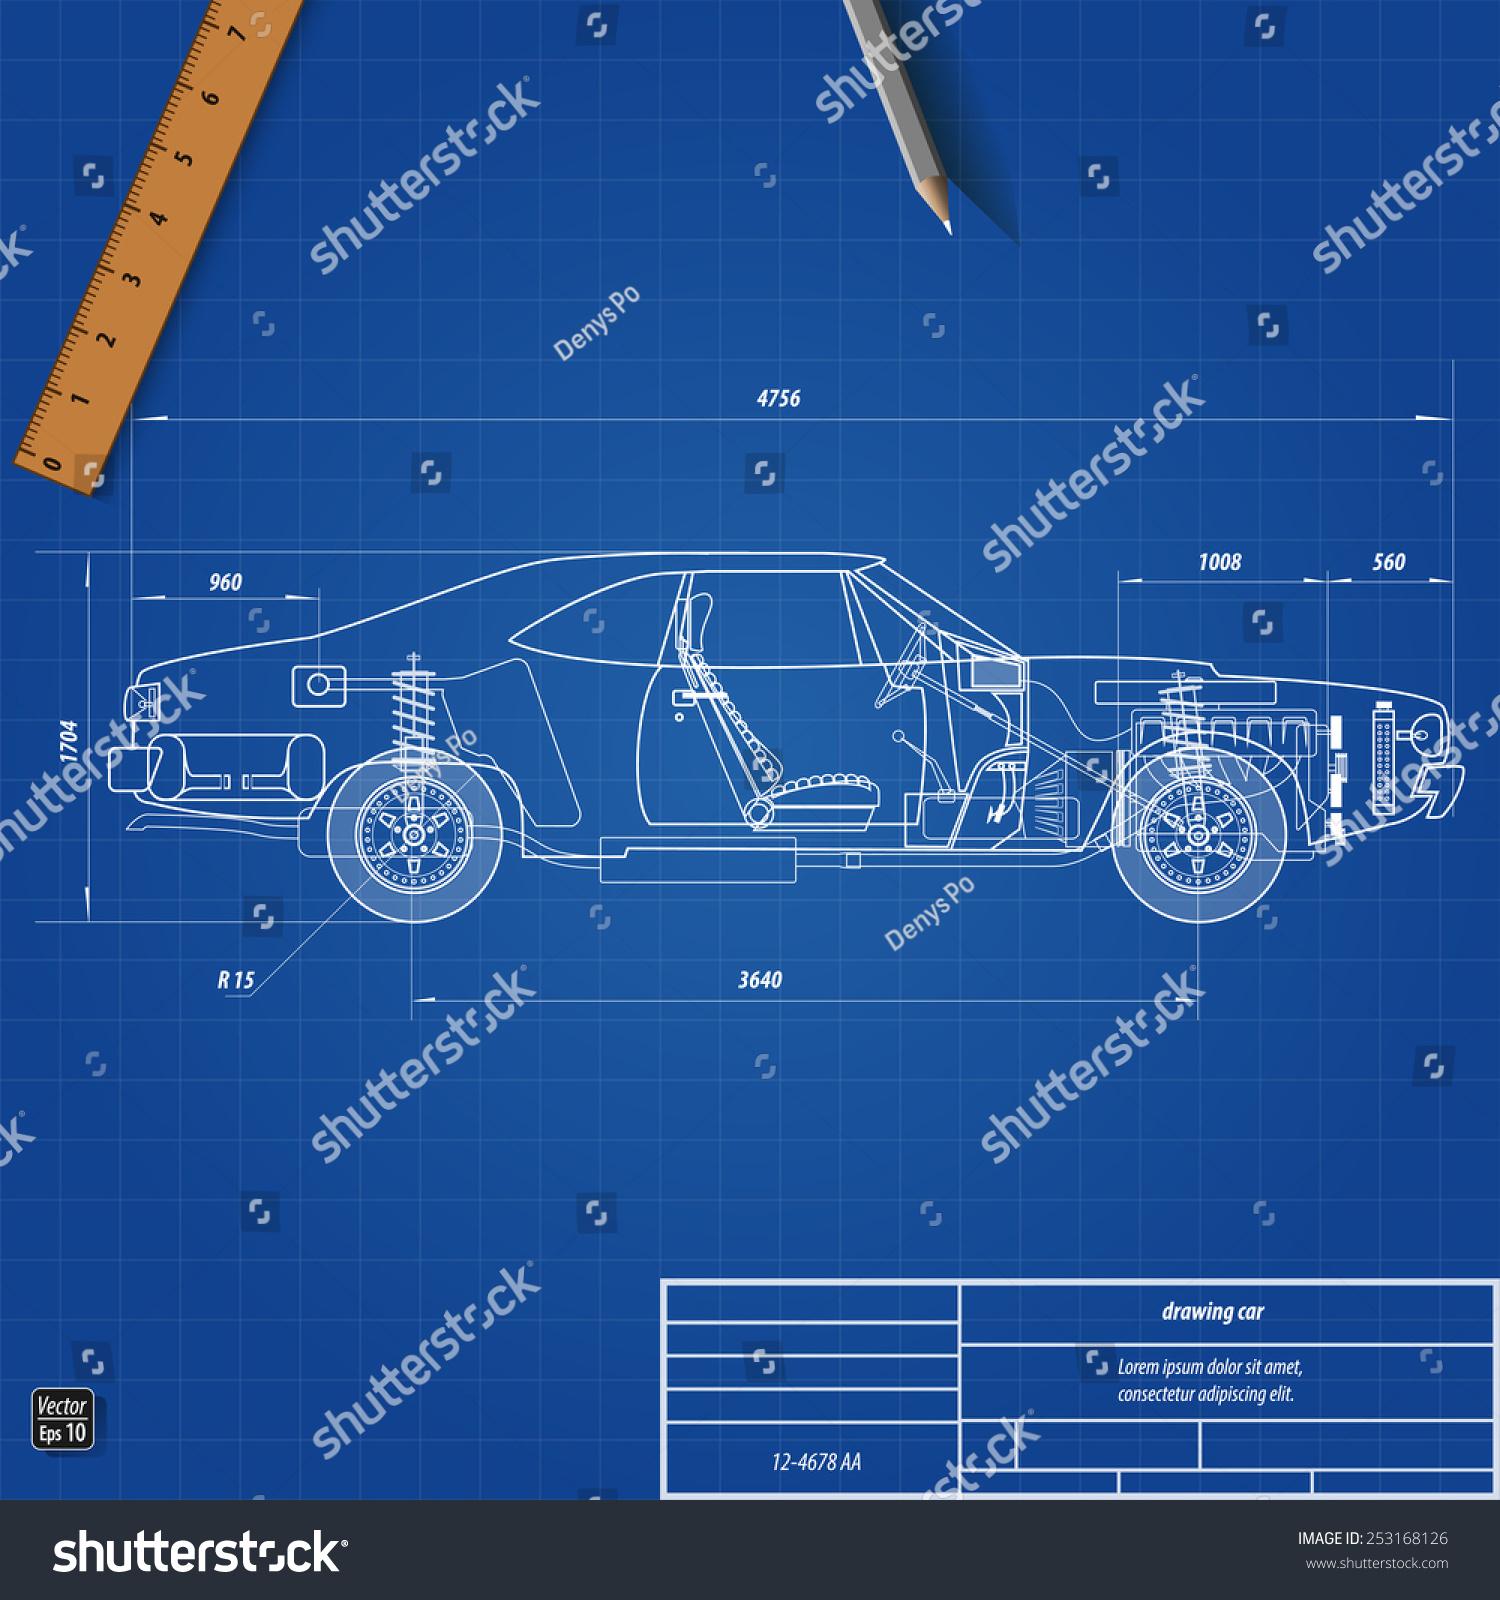 Old car blueprint vector illustration eps vectores en stock old car blueprint vector illustration eps 10 malvernweather Images